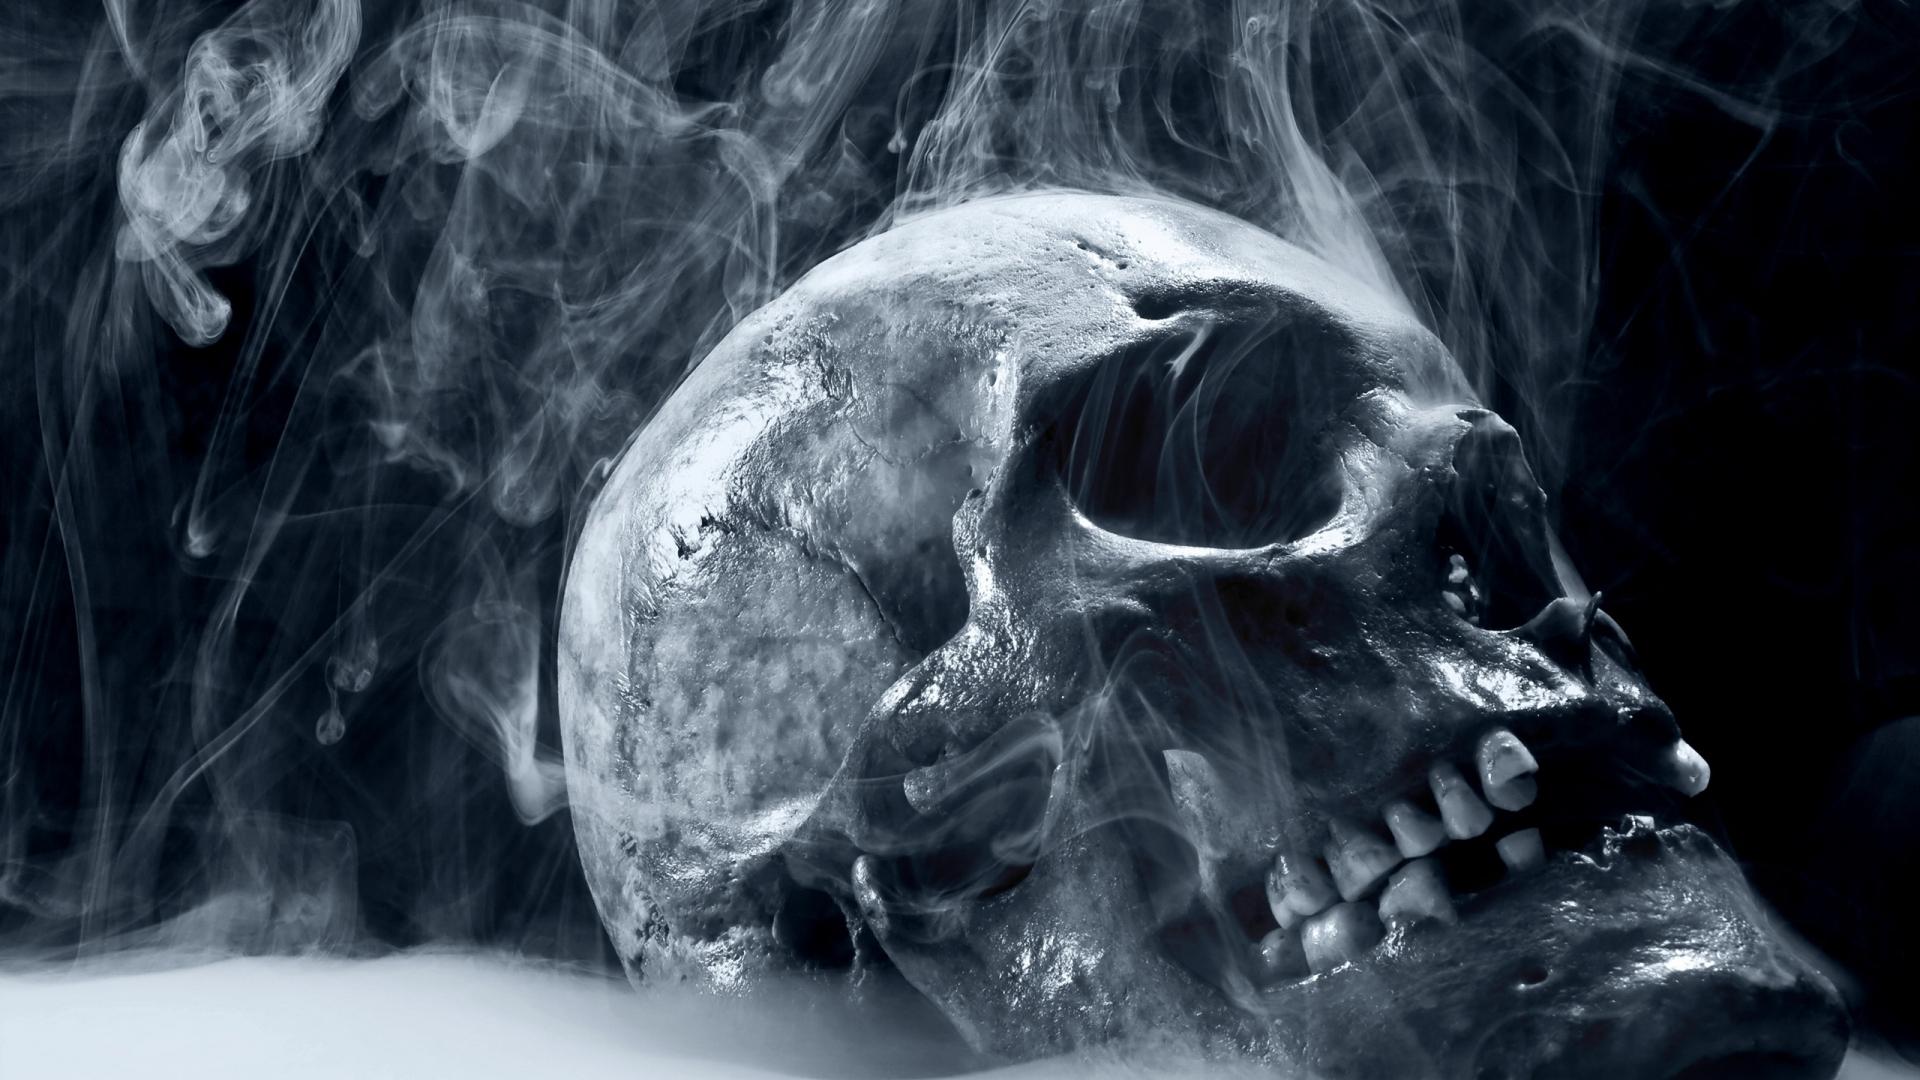 Scary Skull Wallpapers For Desktop 19202151080 22746 HD 1920x1080